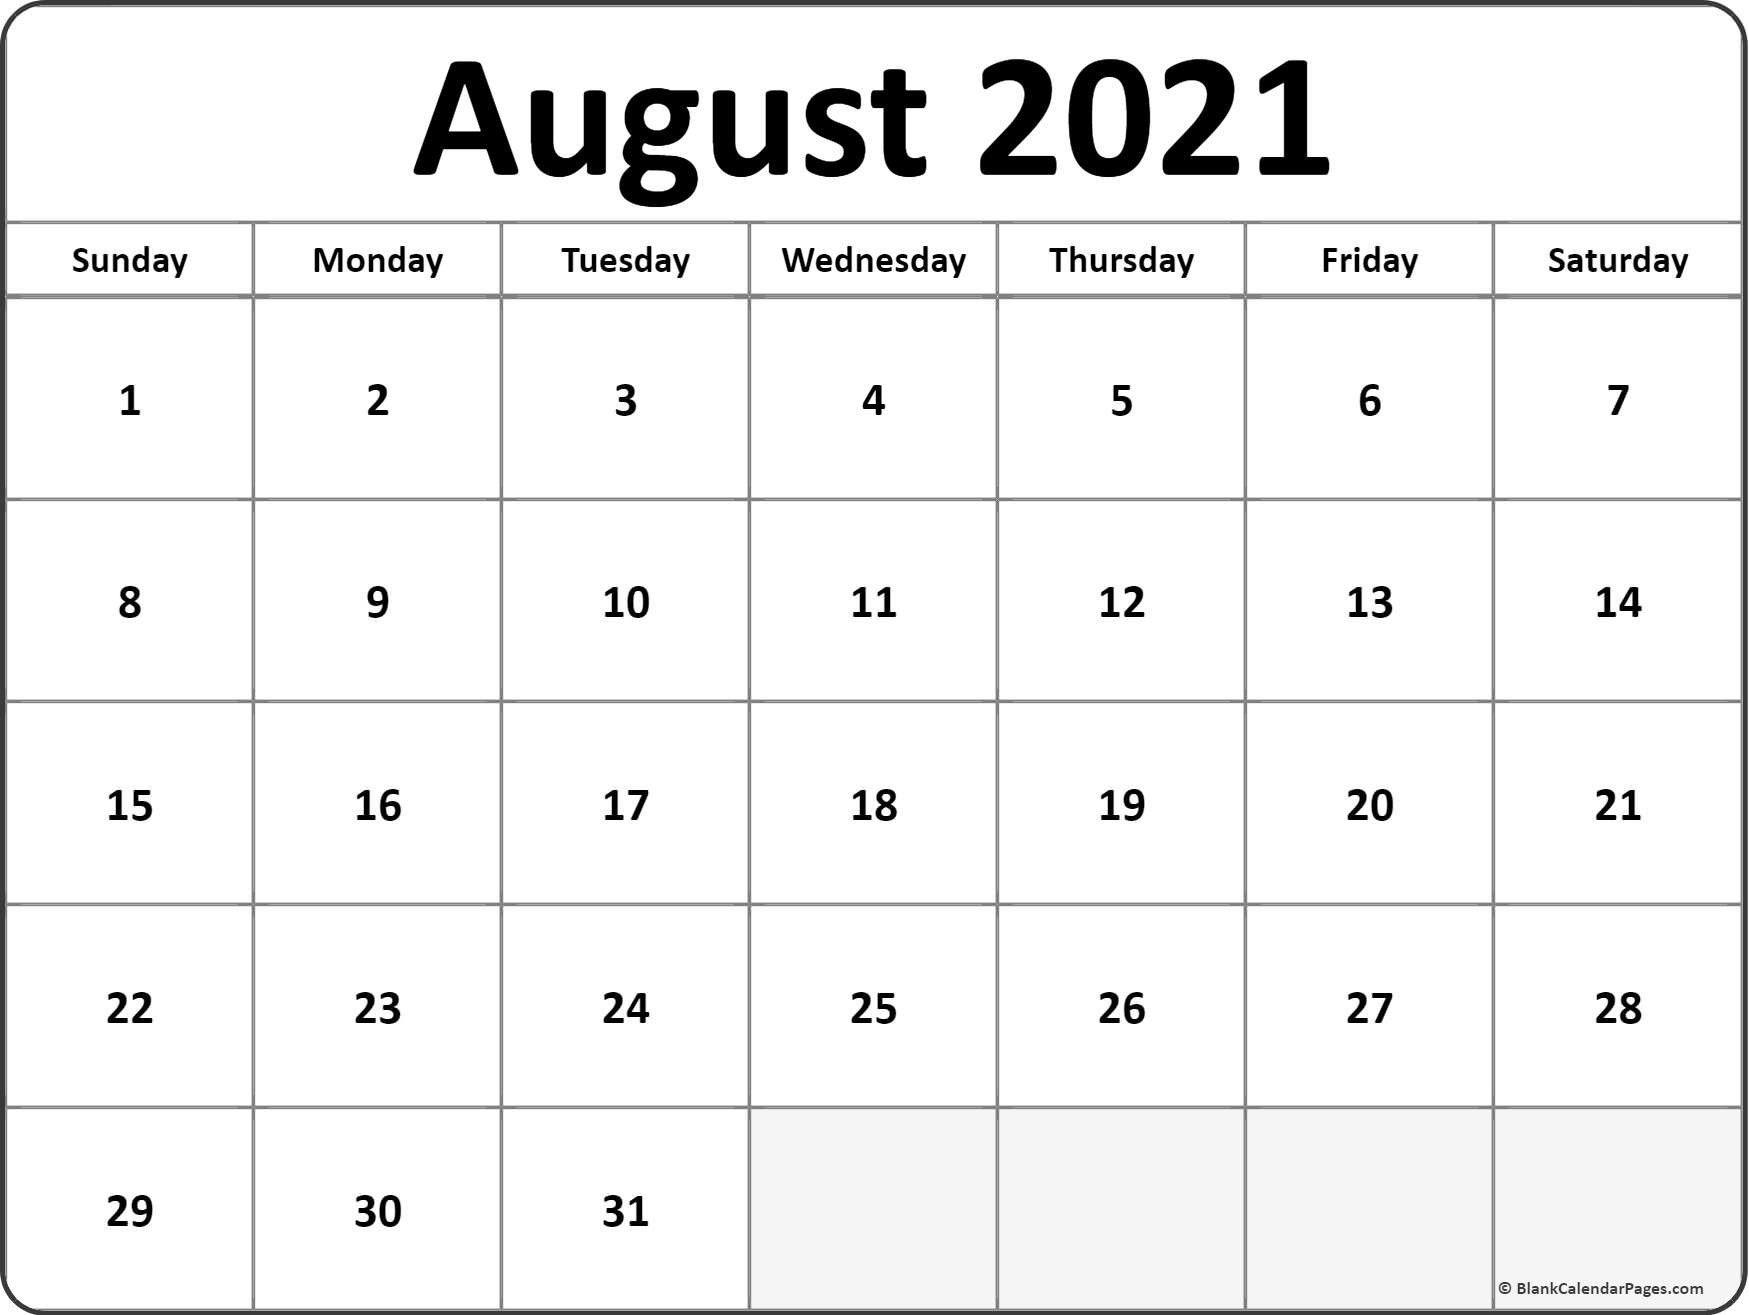 Pick August 2021 Printable Calendar